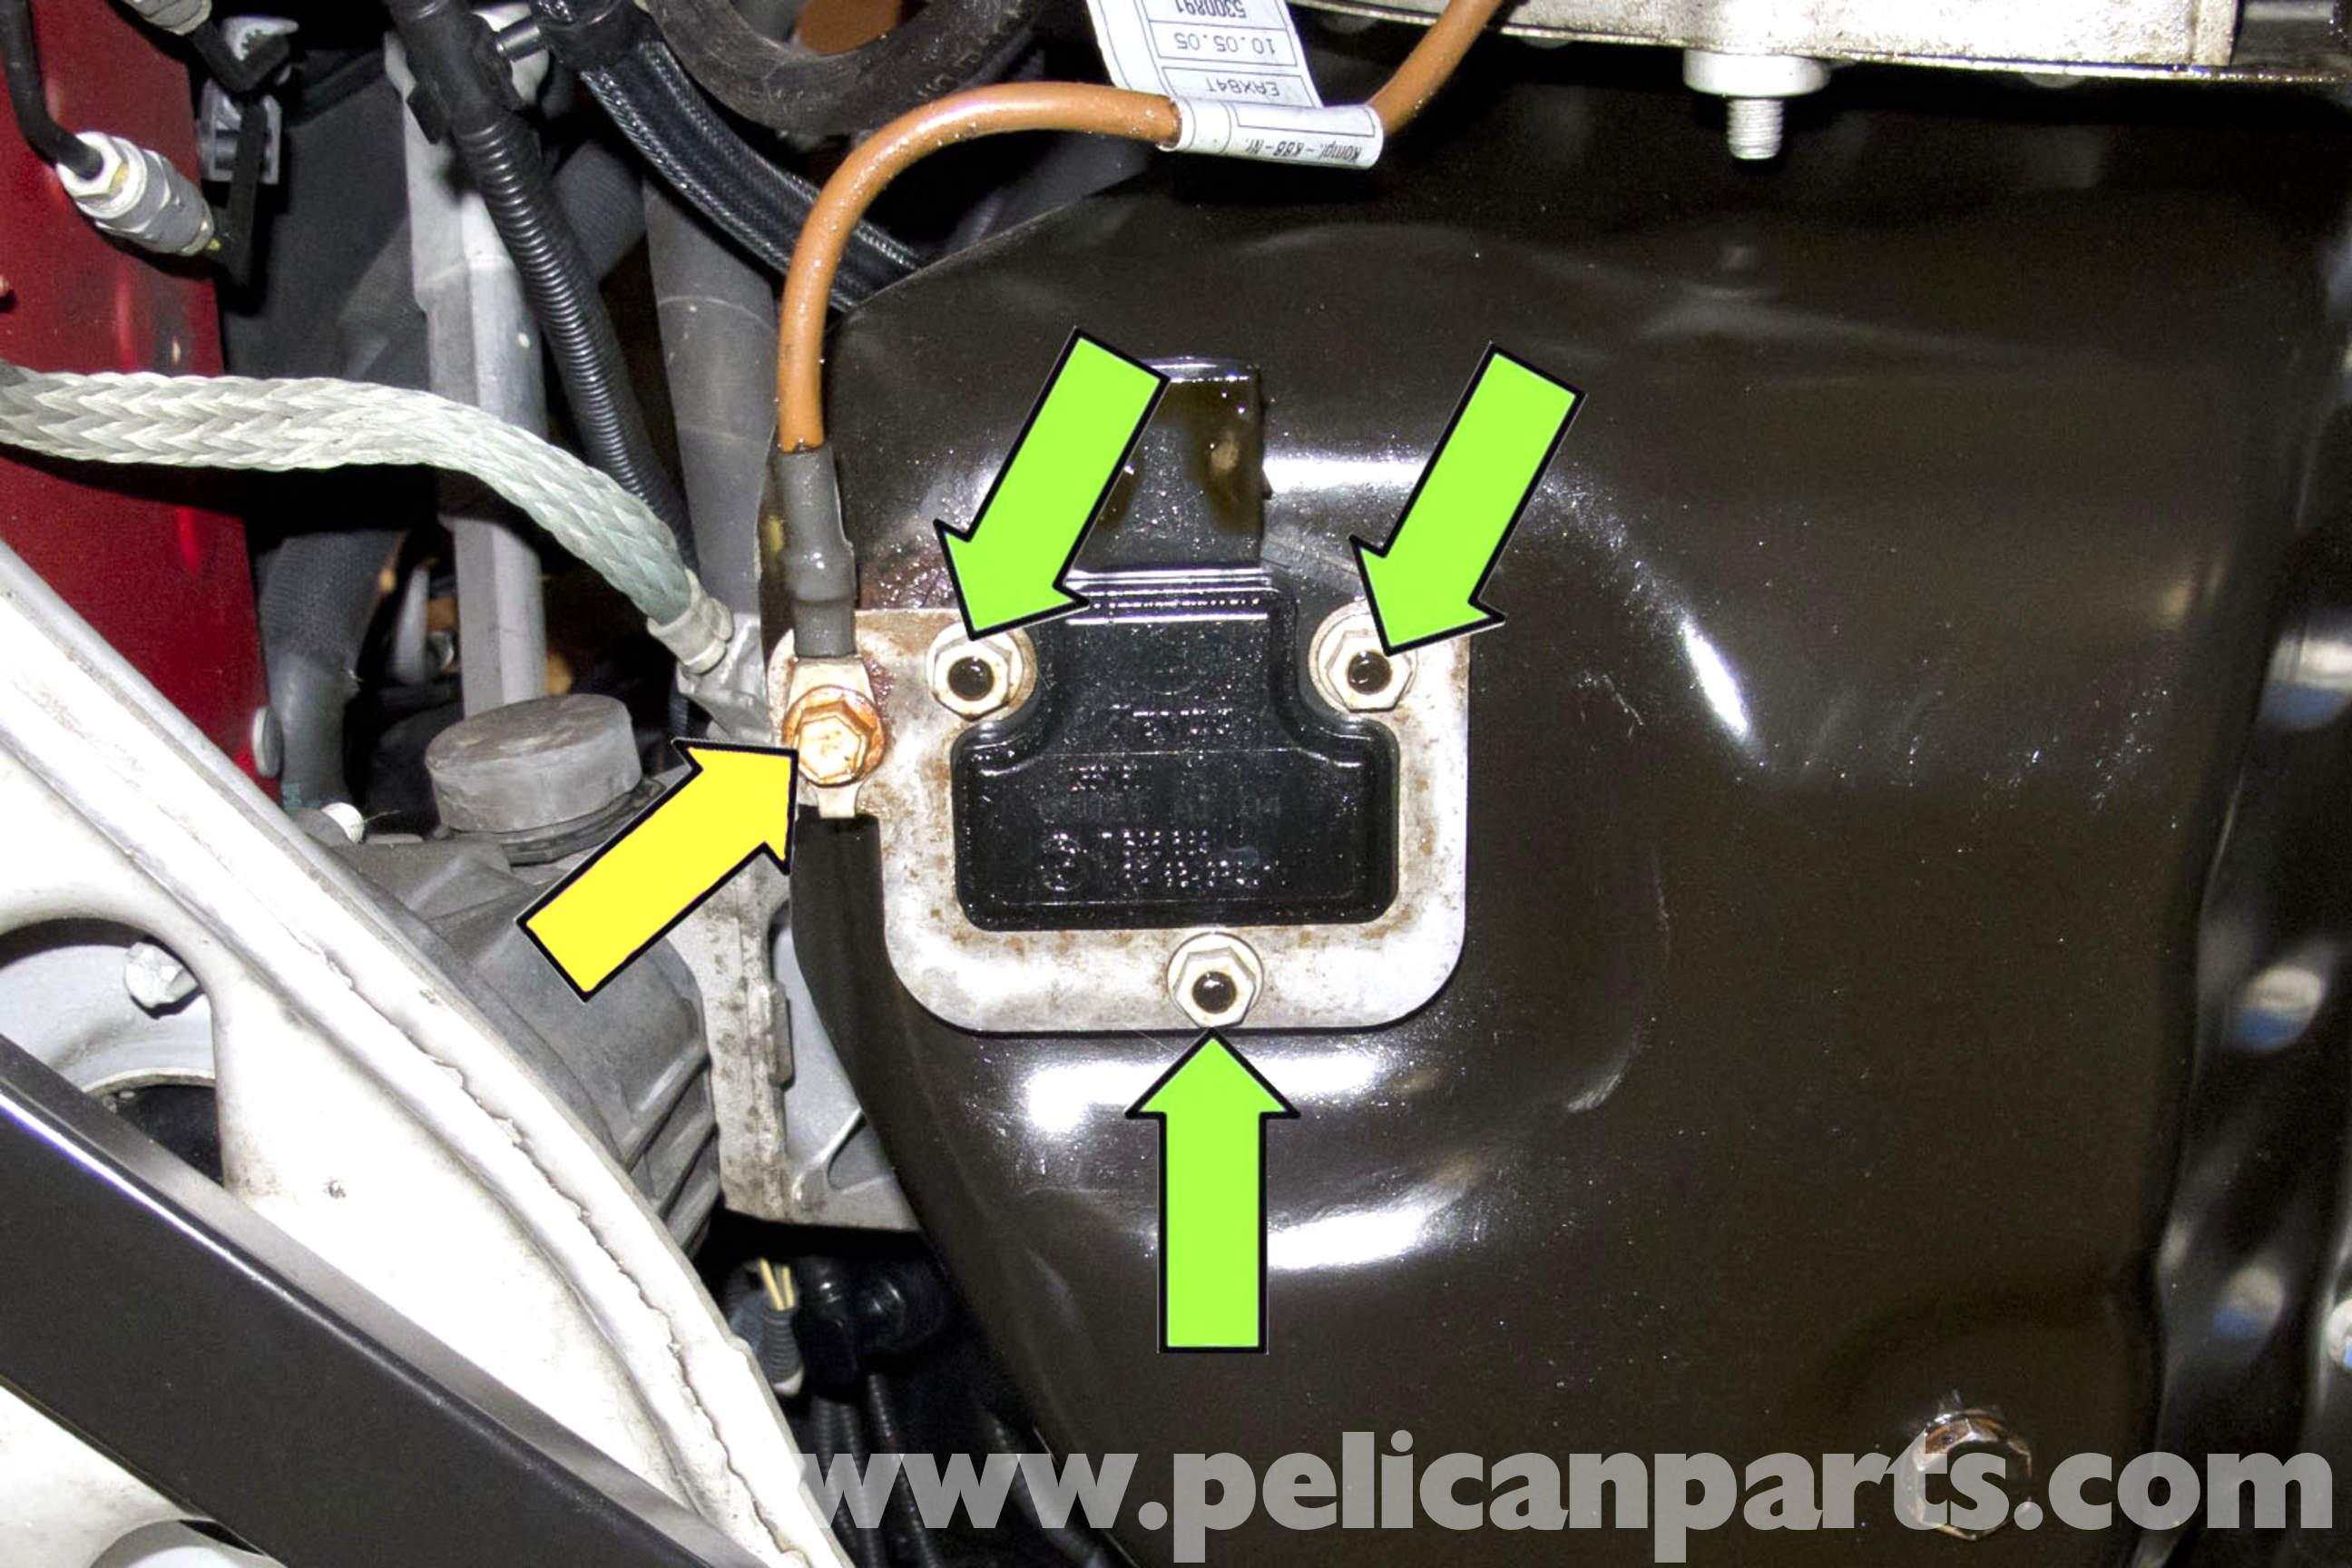 Bmw E90 Oil Condition Sensor Replacement E91 E92 E93 Pelican Fuse Diagram Large Image Extra